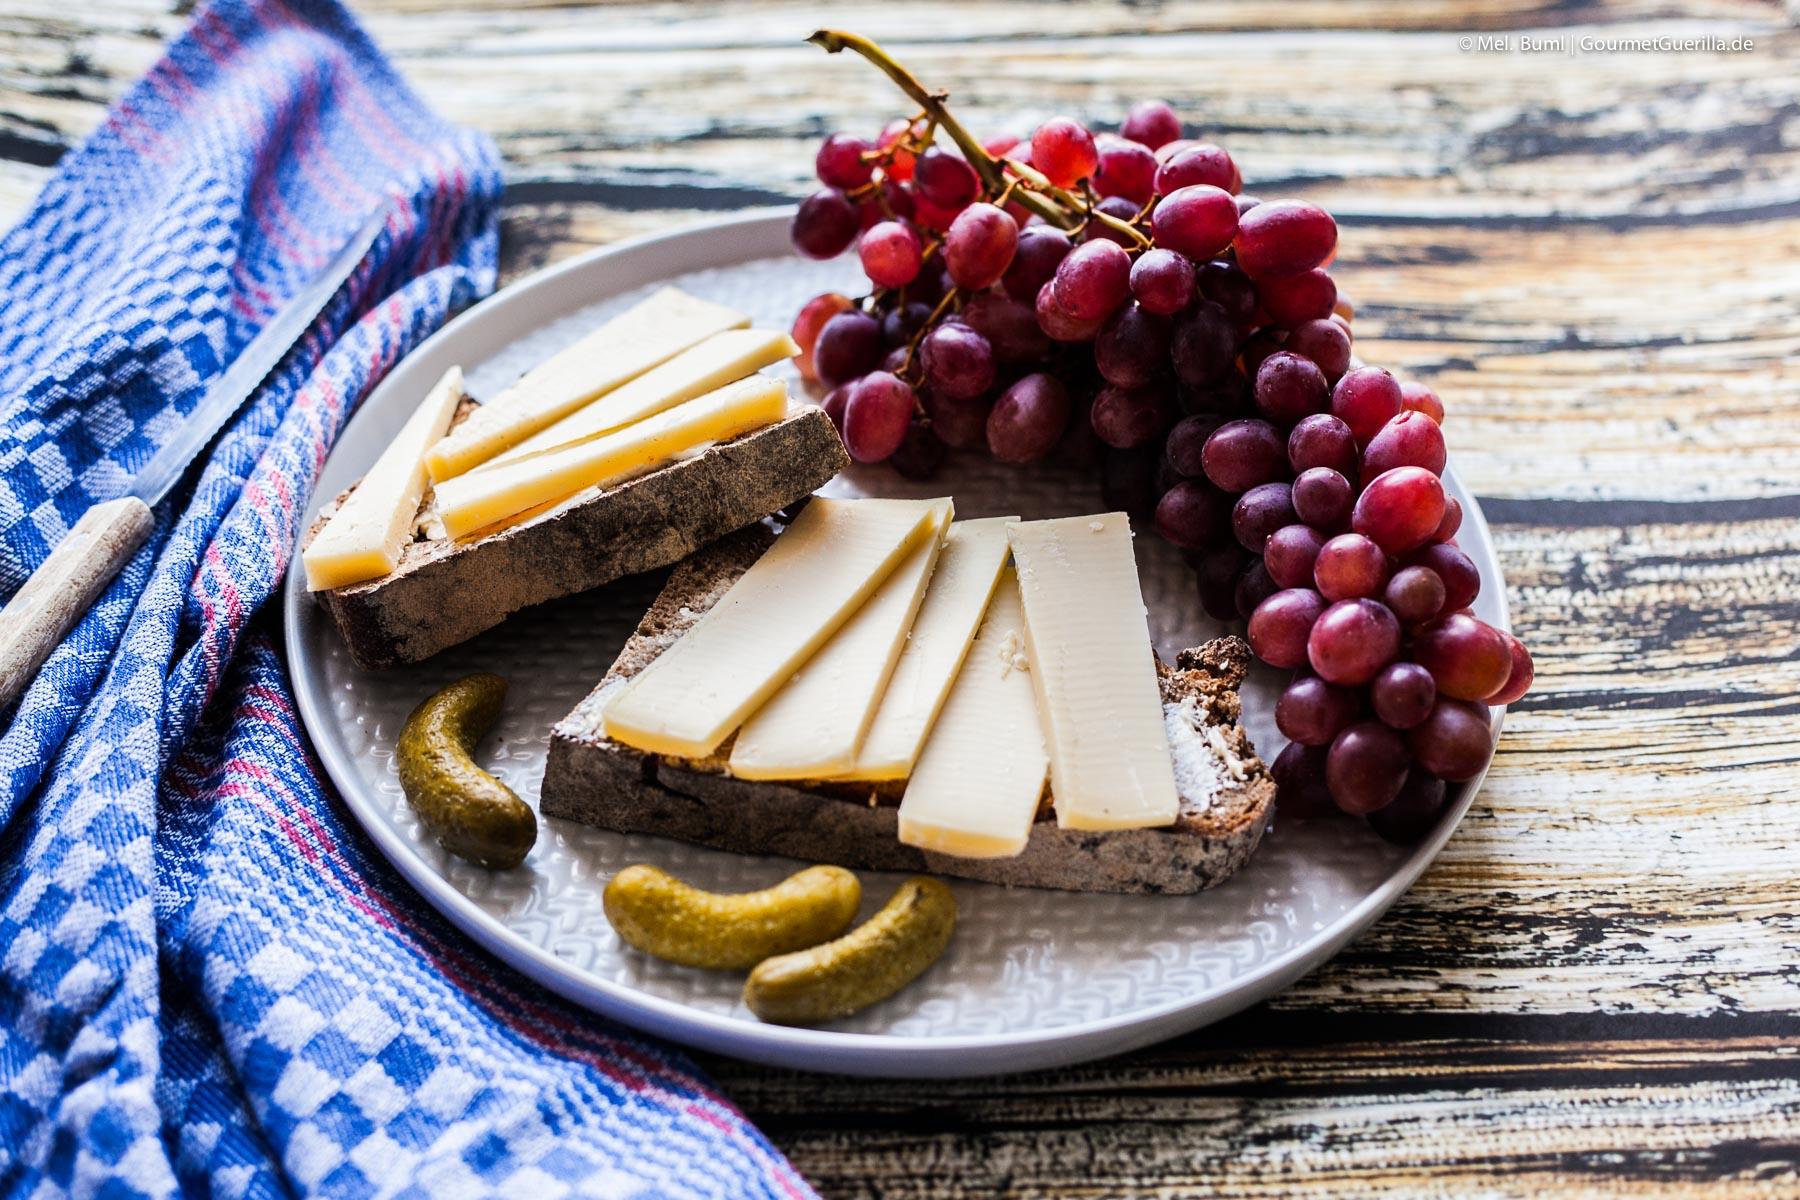 Käsestulle zum Abendbrot mit pikanter Zitronenmarmelade |GourmetGuerilla.de